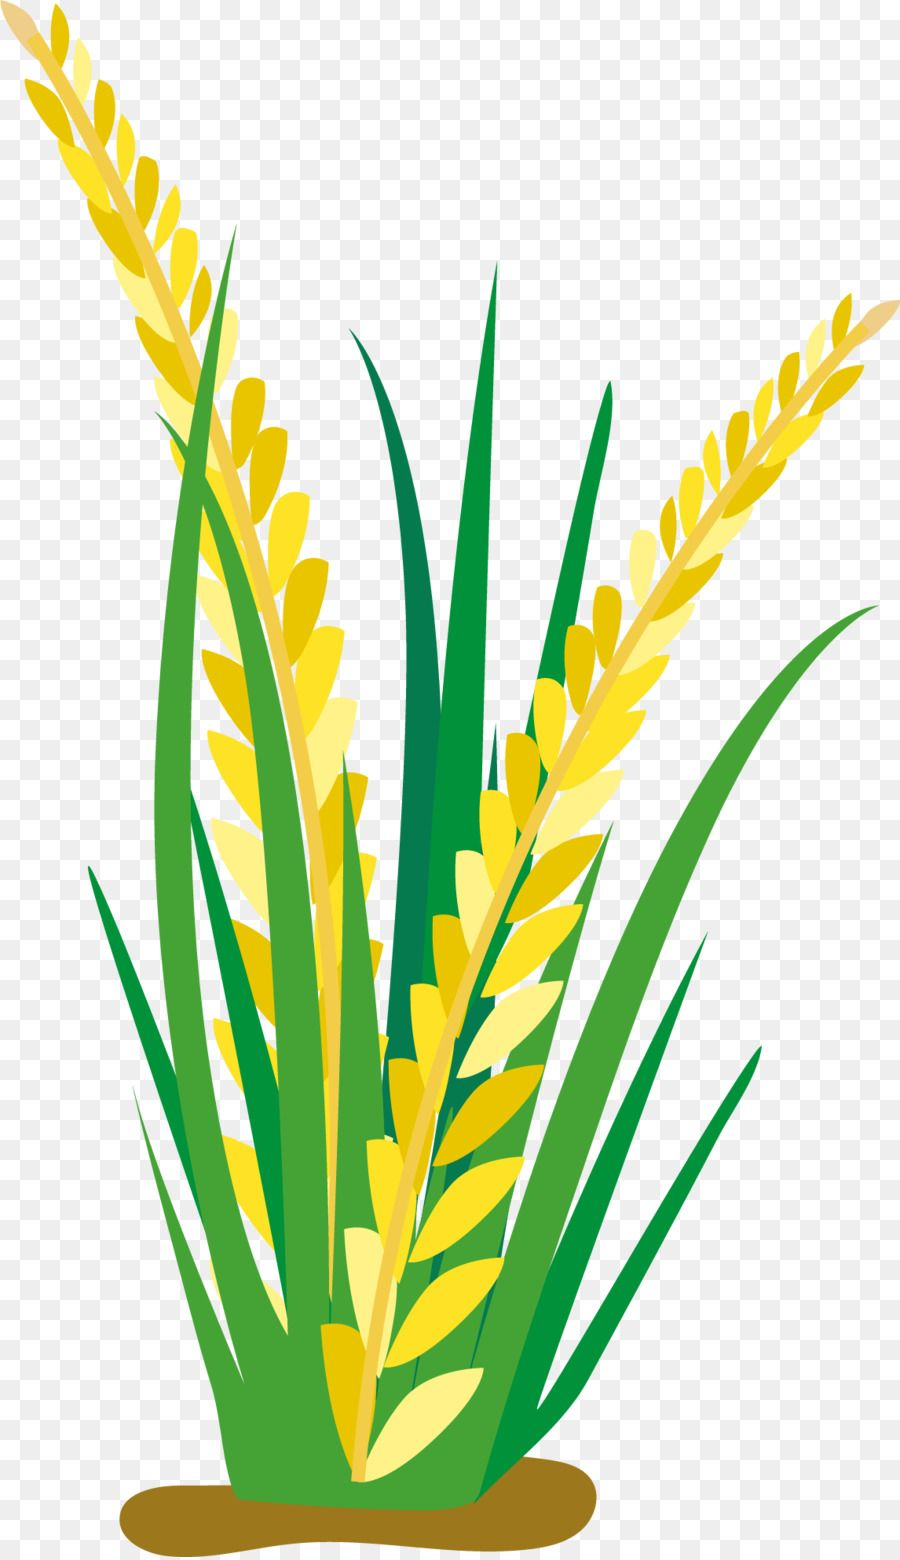 Rice Paddies Clip Art